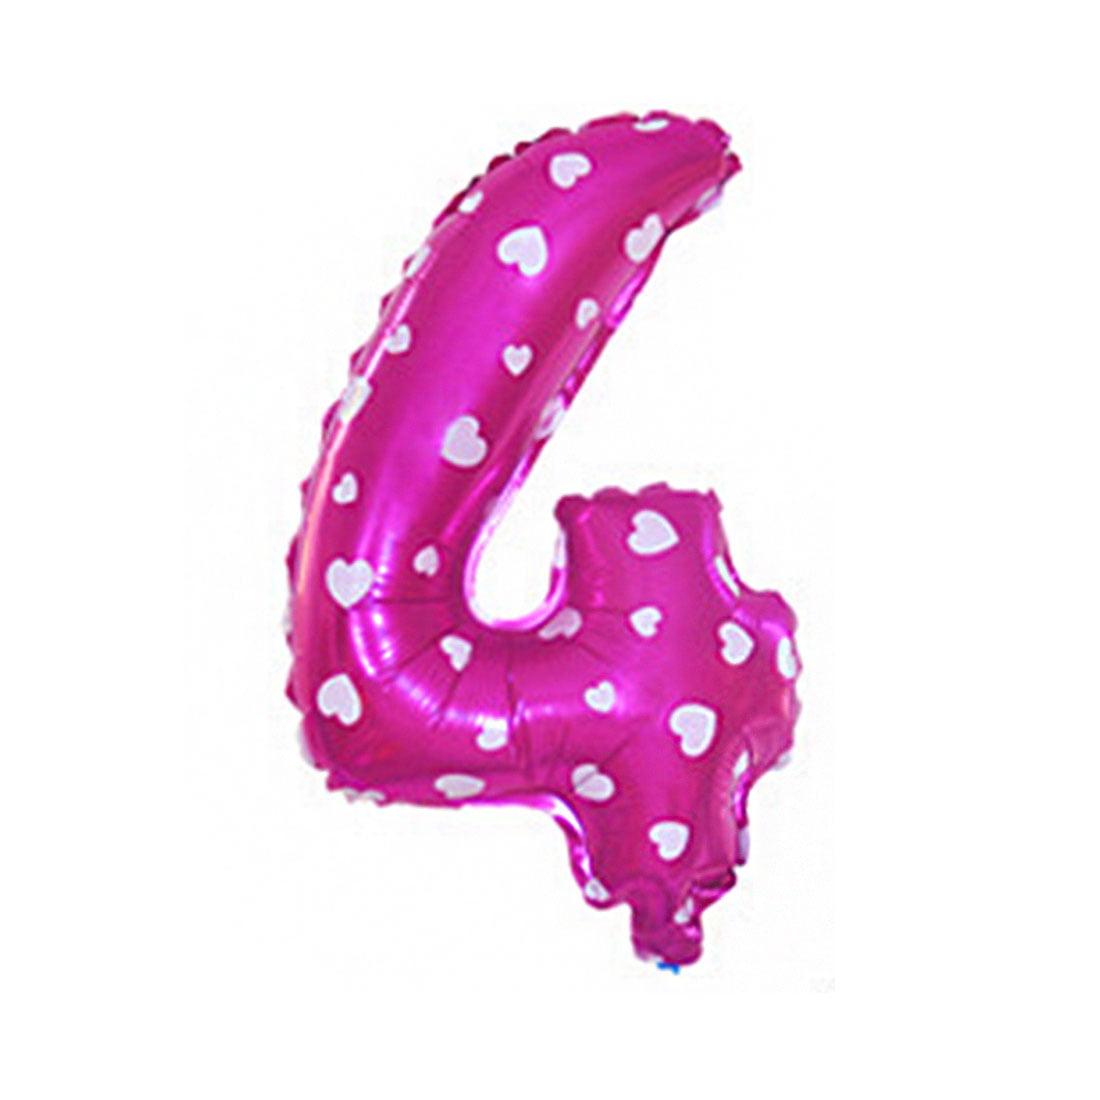 "Unique Bargains 16"" Fuchsia Foil Number 4 Shape Balloon Helium Birthday Wedding Decor"